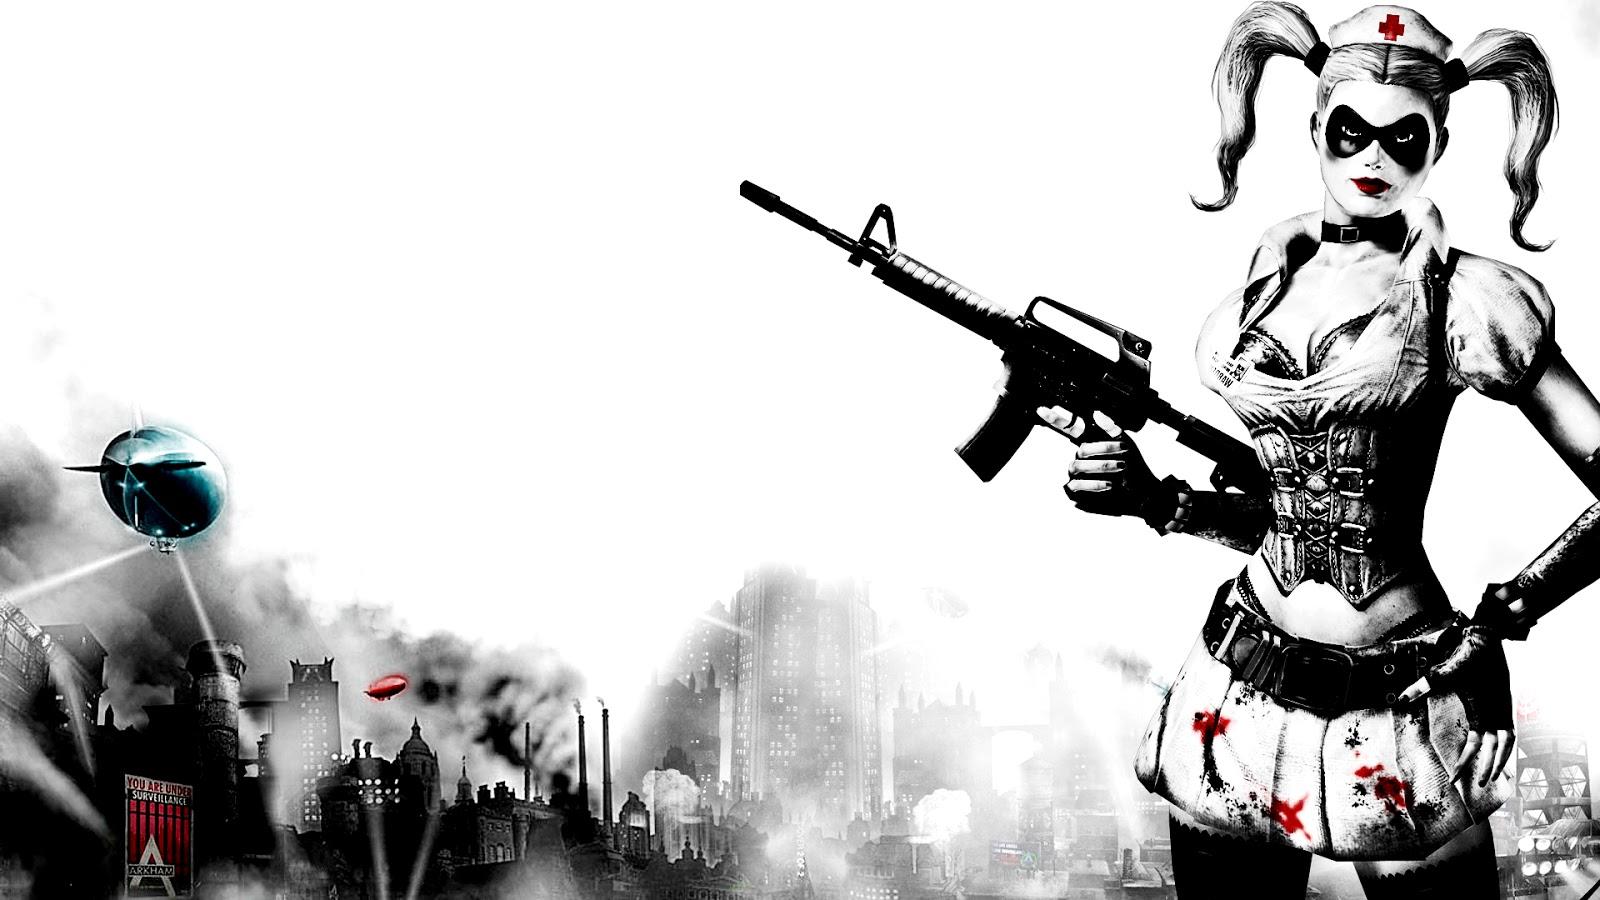 http://1.bp.blogspot.com/-Bkgm1PRptUo/TtqelMVVQBI/AAAAAAAAEuE/oJWM1vVNDAQ/s1600/Harley_Quinn_Rifle_Arkham_Asylum_HD_Wallpaper.jpg